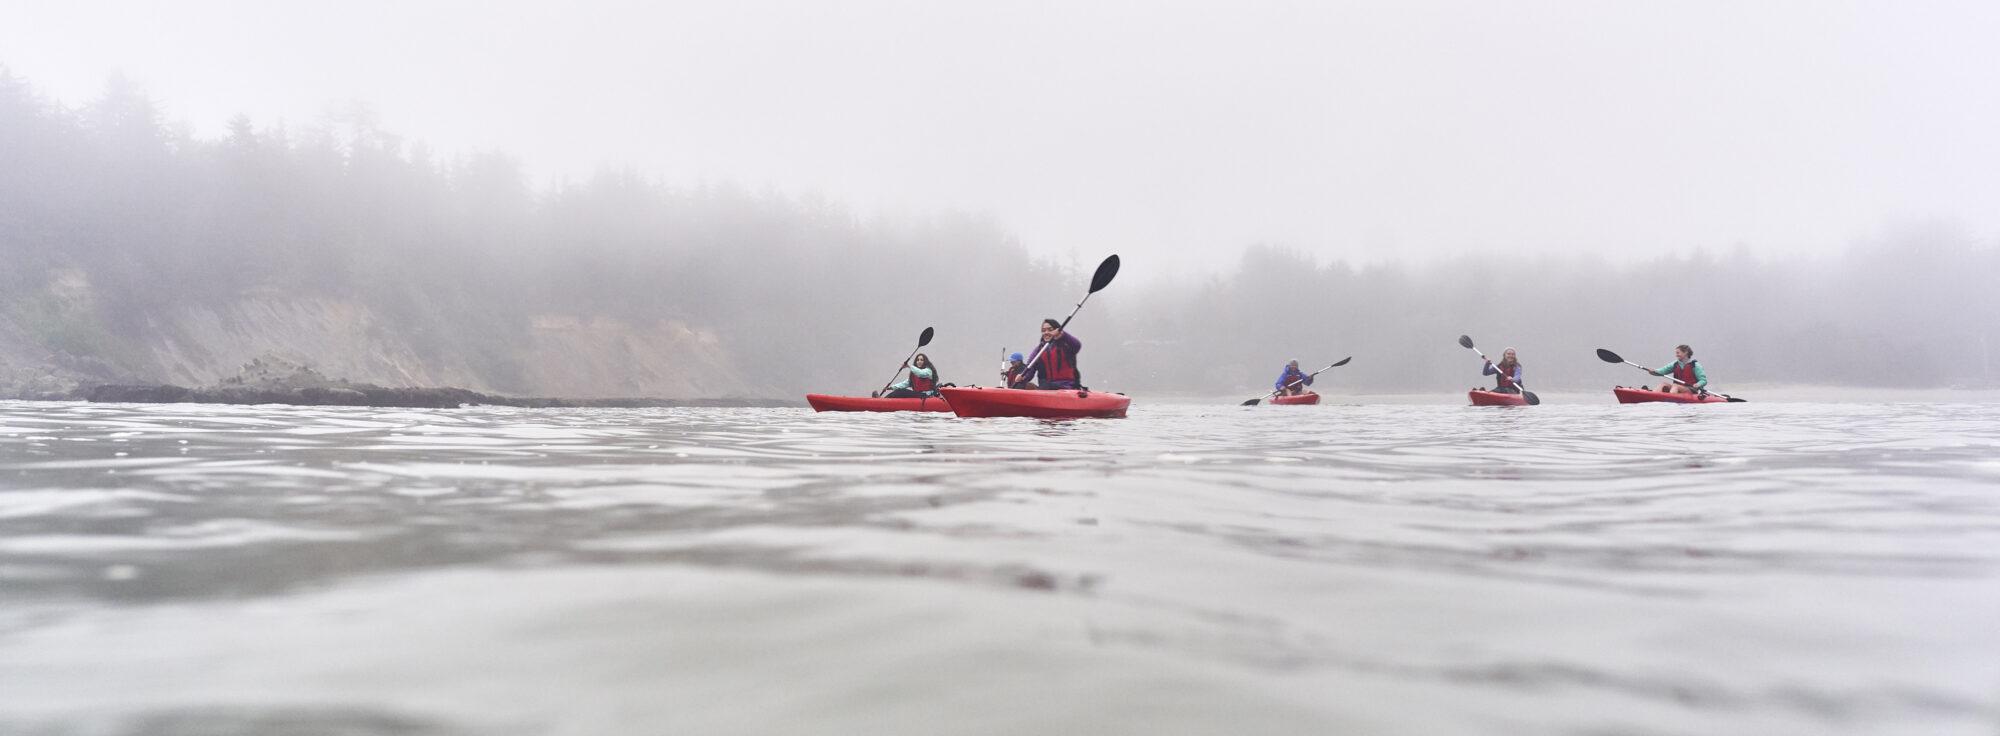 people kayaking on the oregon coast overcast